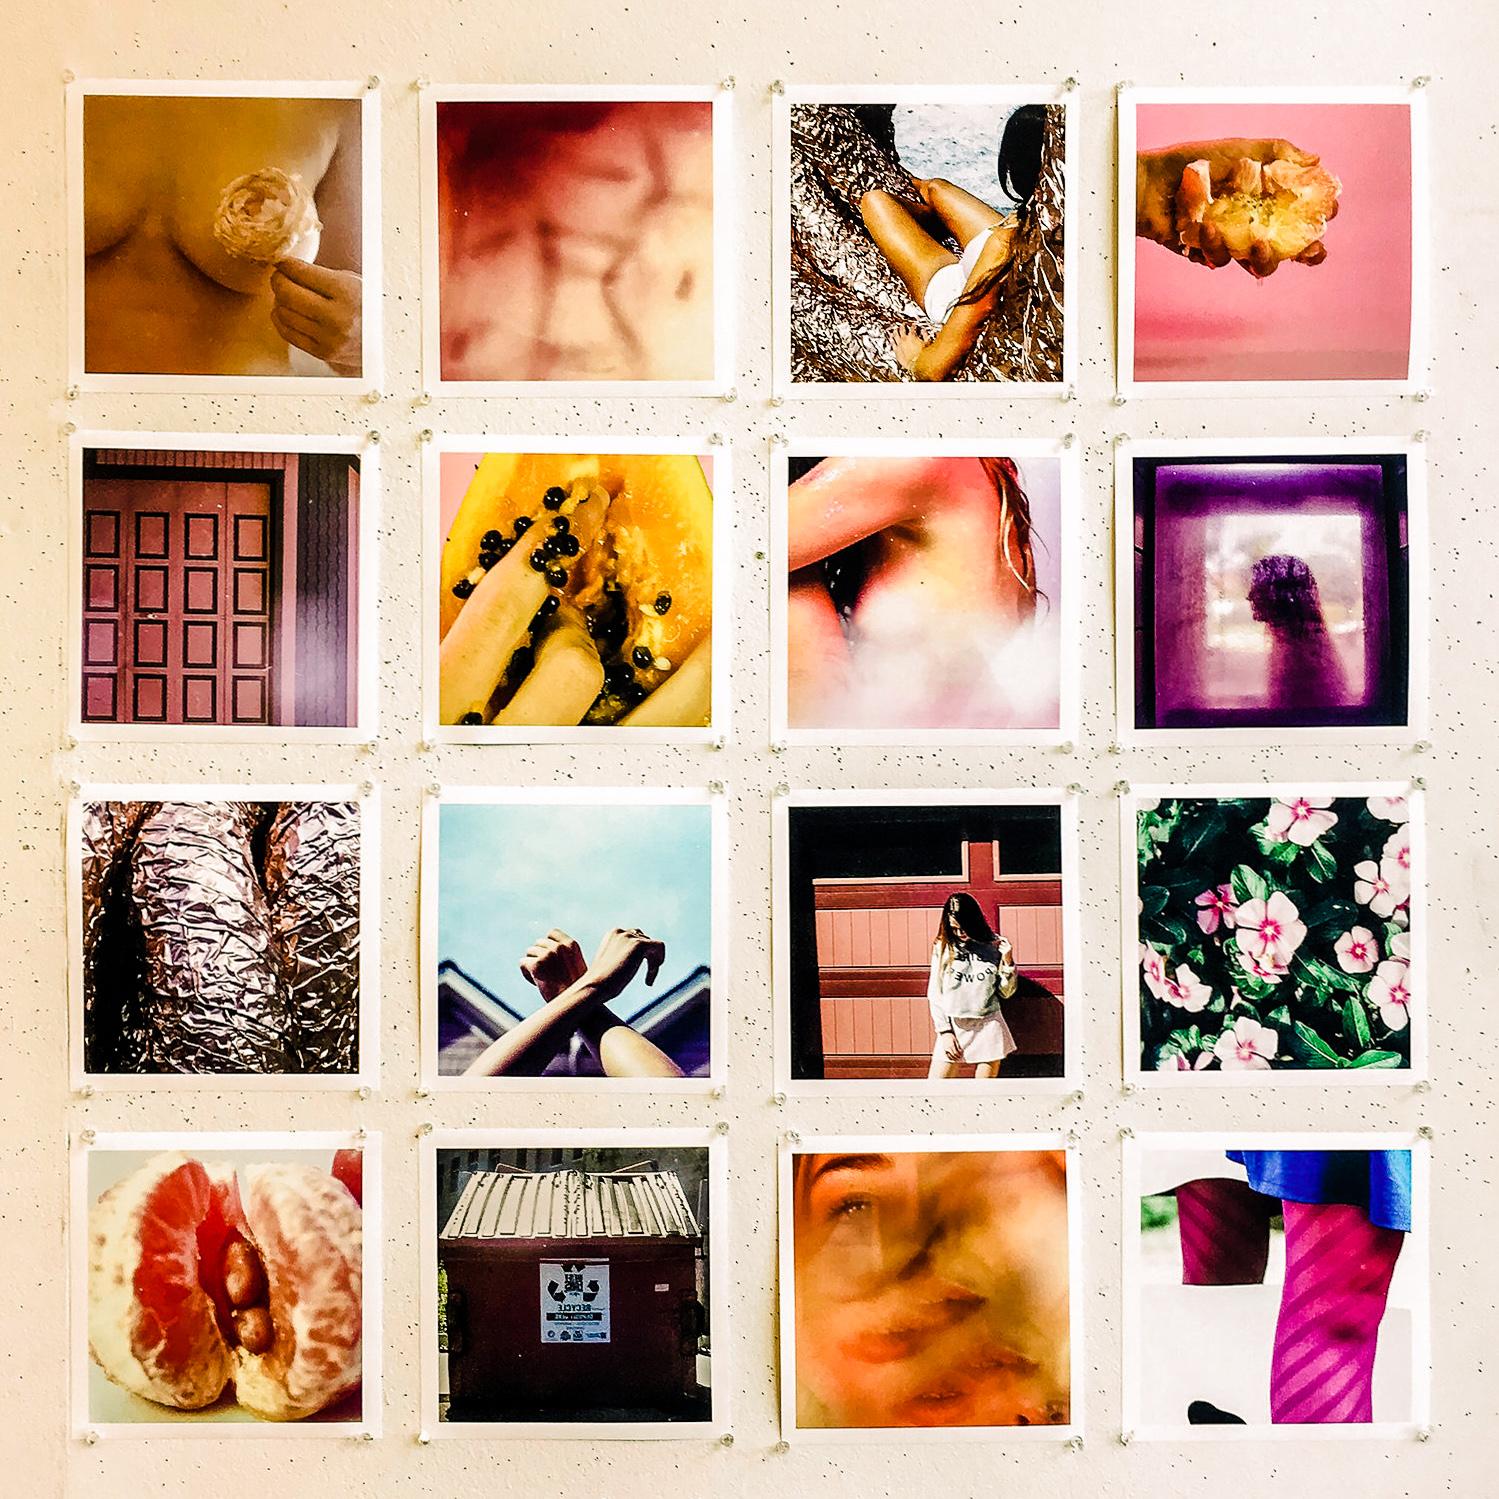 GIRL+part+1-Edit.jpg